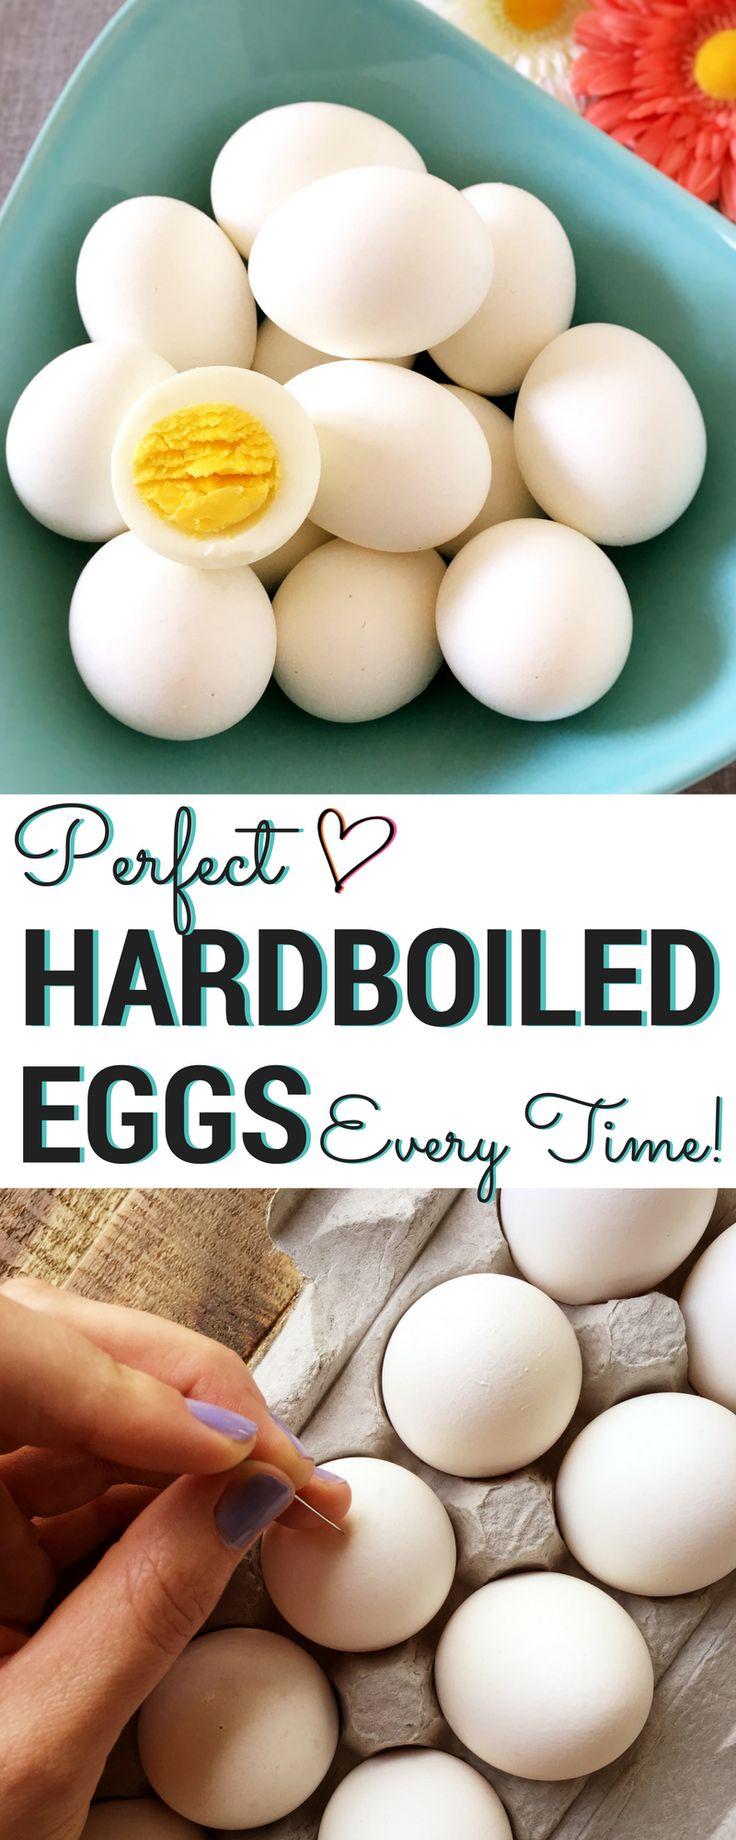 The 25 best Egg nutritional value ideas on Pinterest